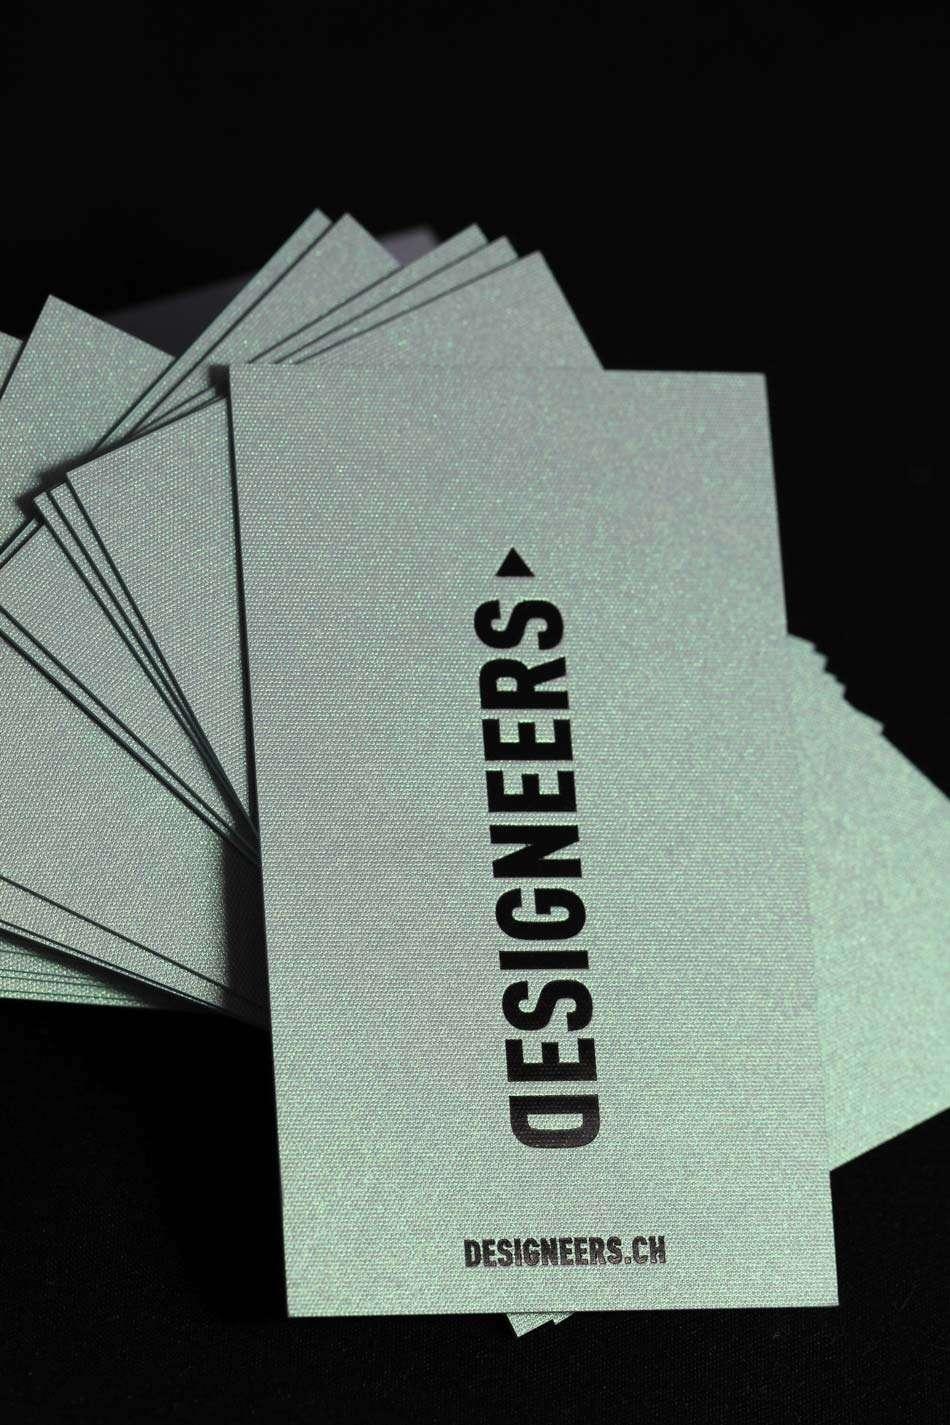 Visitenkarte_Business_Card_DESIGNEERS1_2